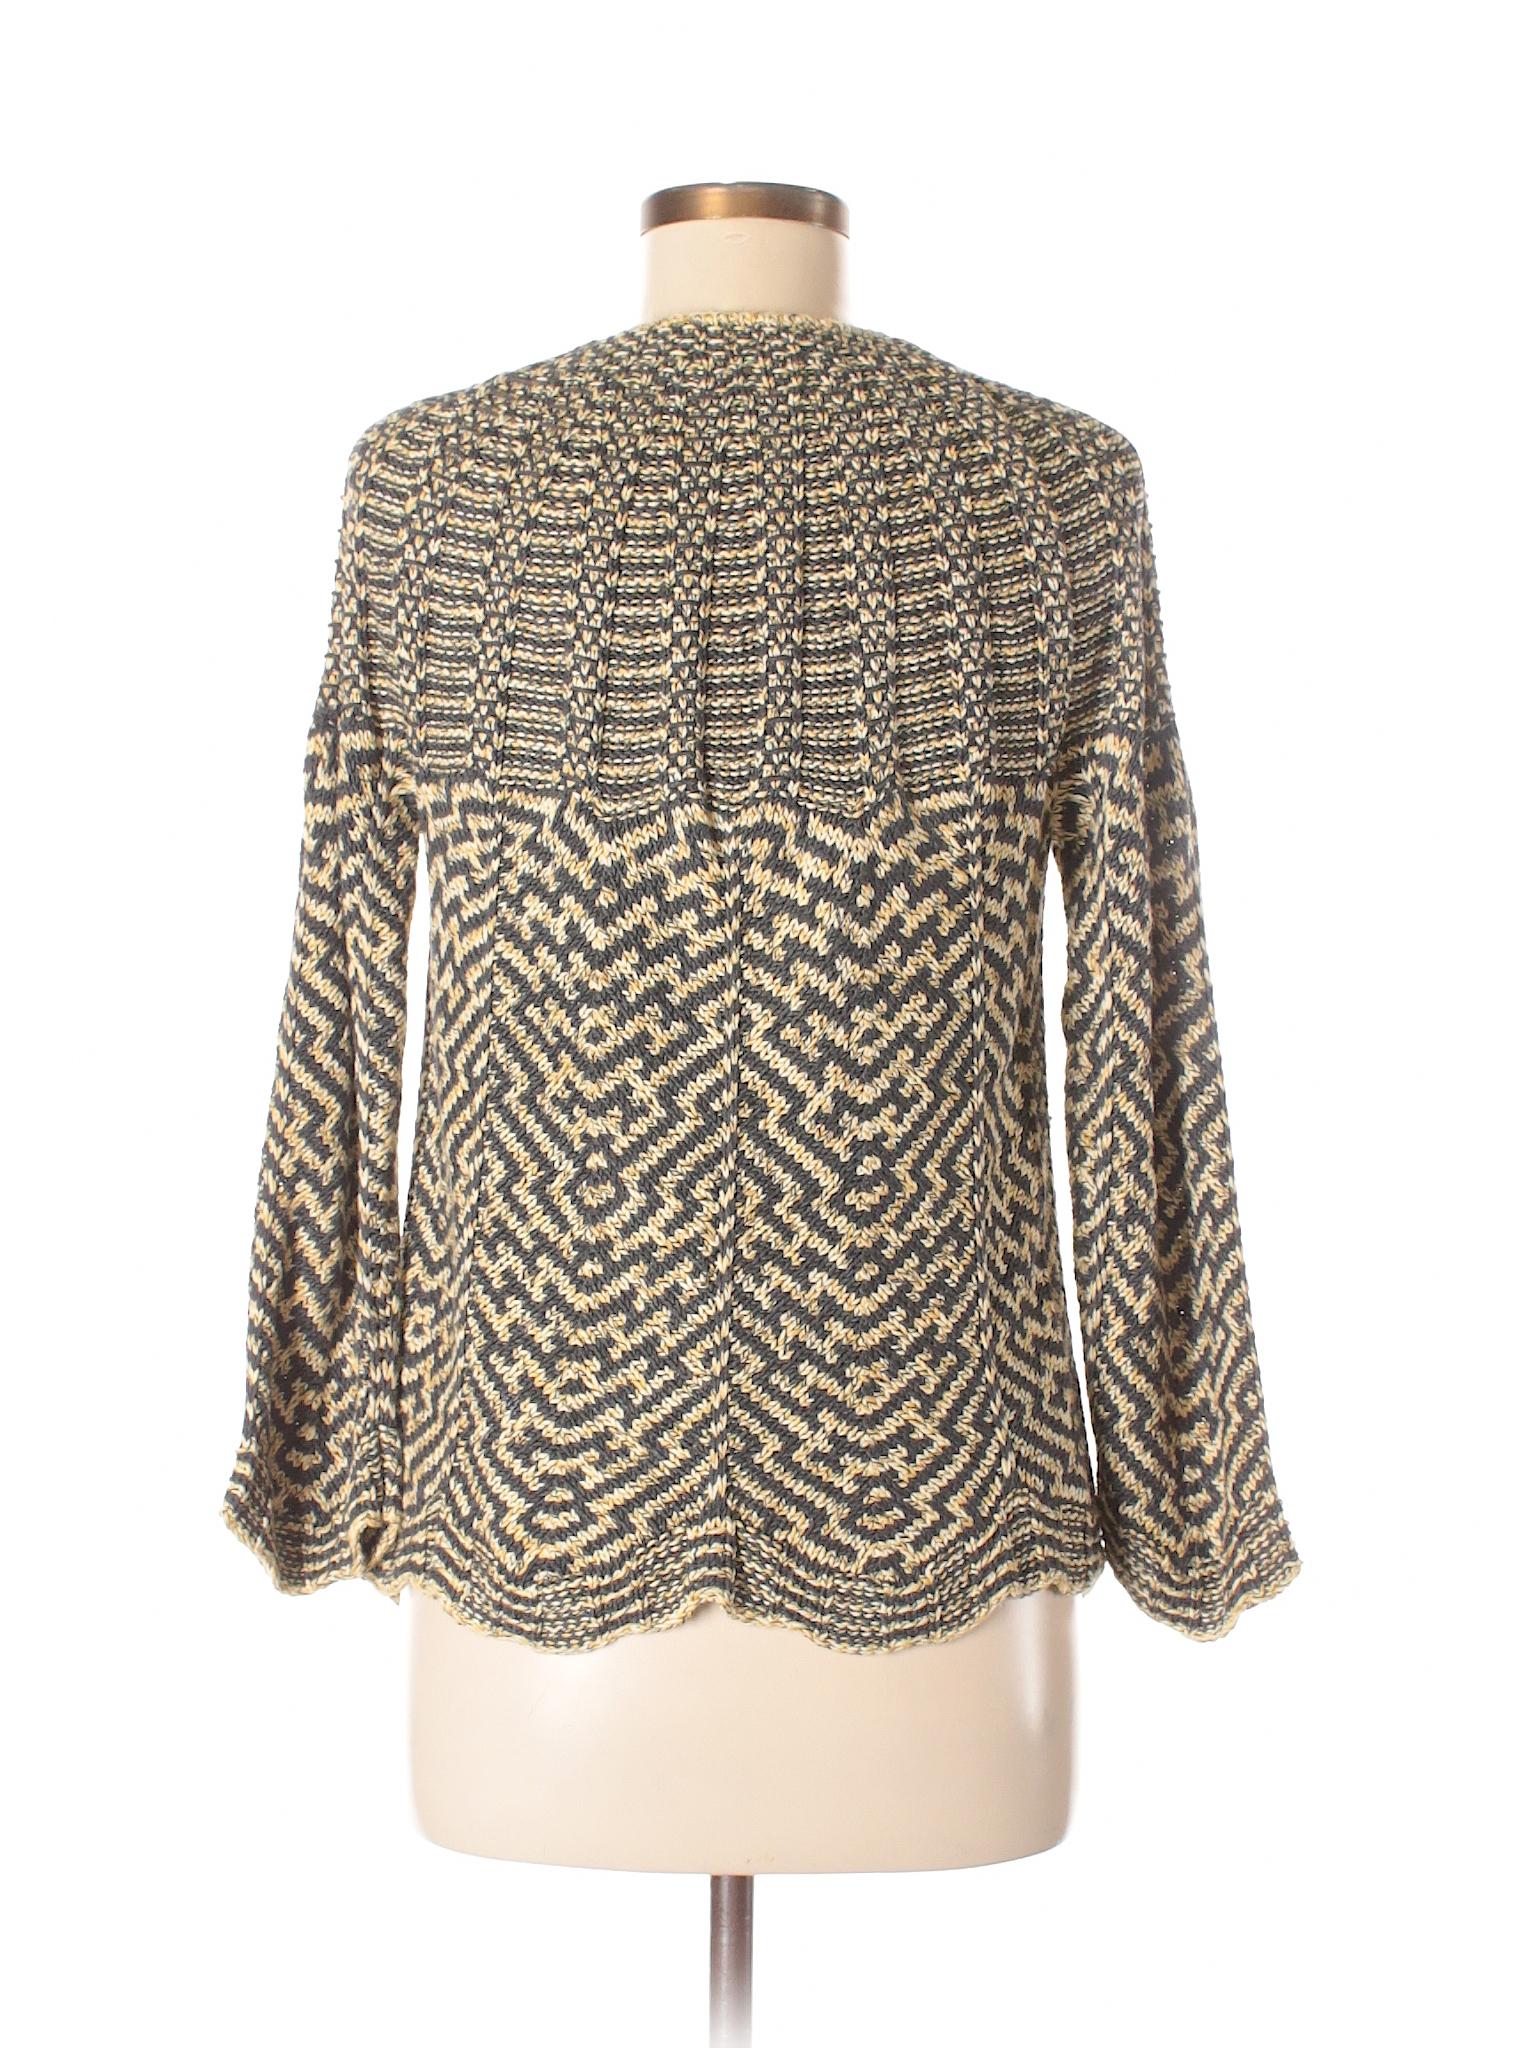 Silk Cardigan Boutique Nic winter Zoe Ycq4wta0